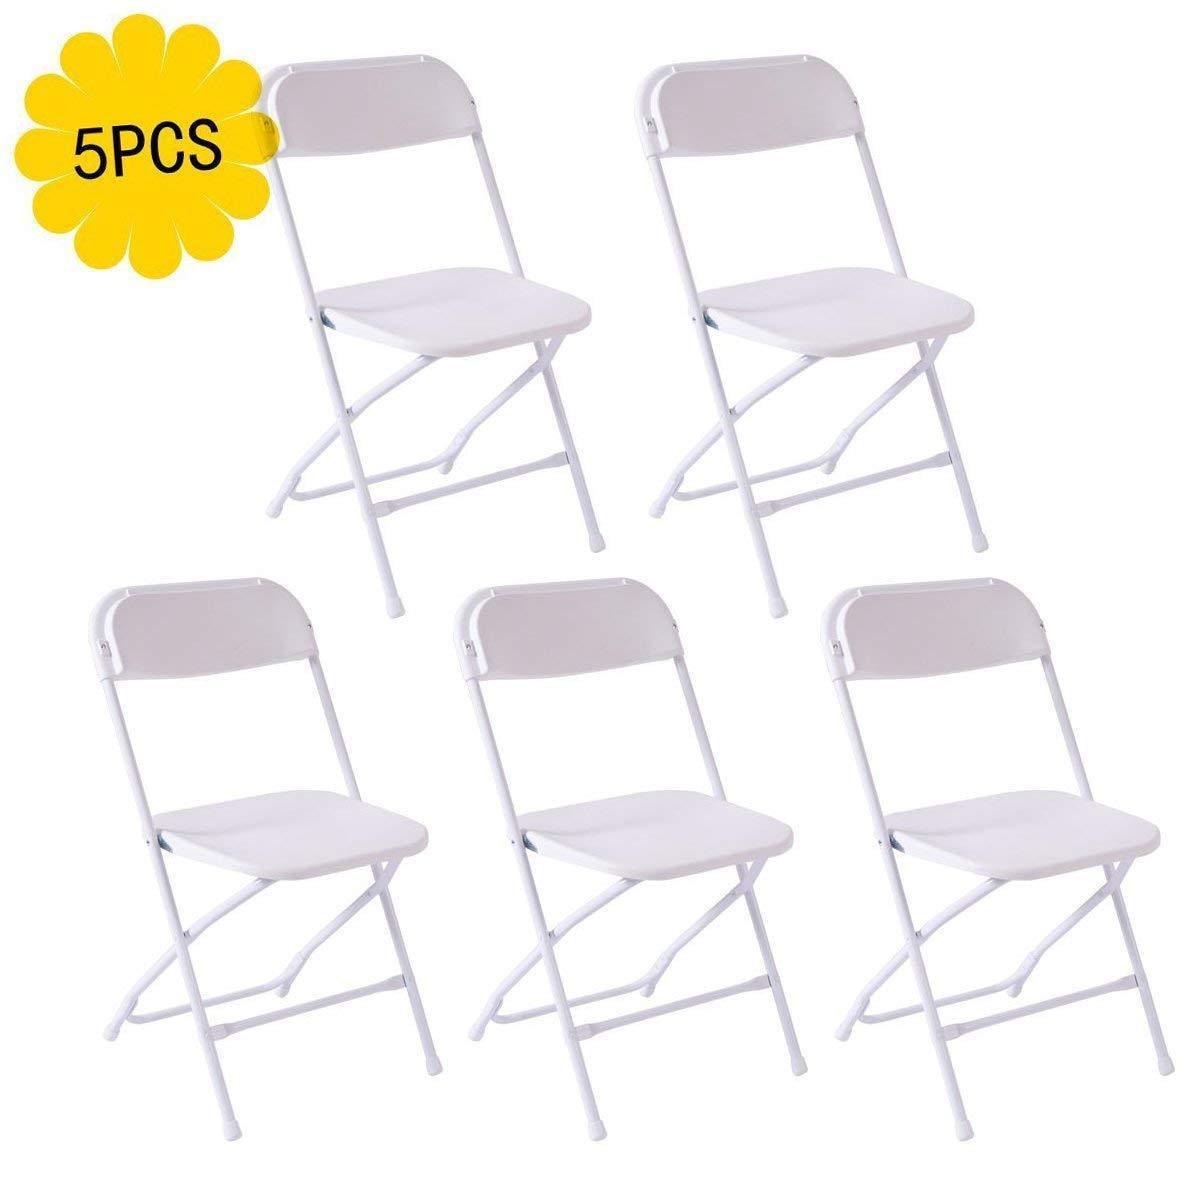 Zimtown 5pcs Plastic Folding Chairs Wedding Party Event Chair Commercial White Walmart Com Walmart Com